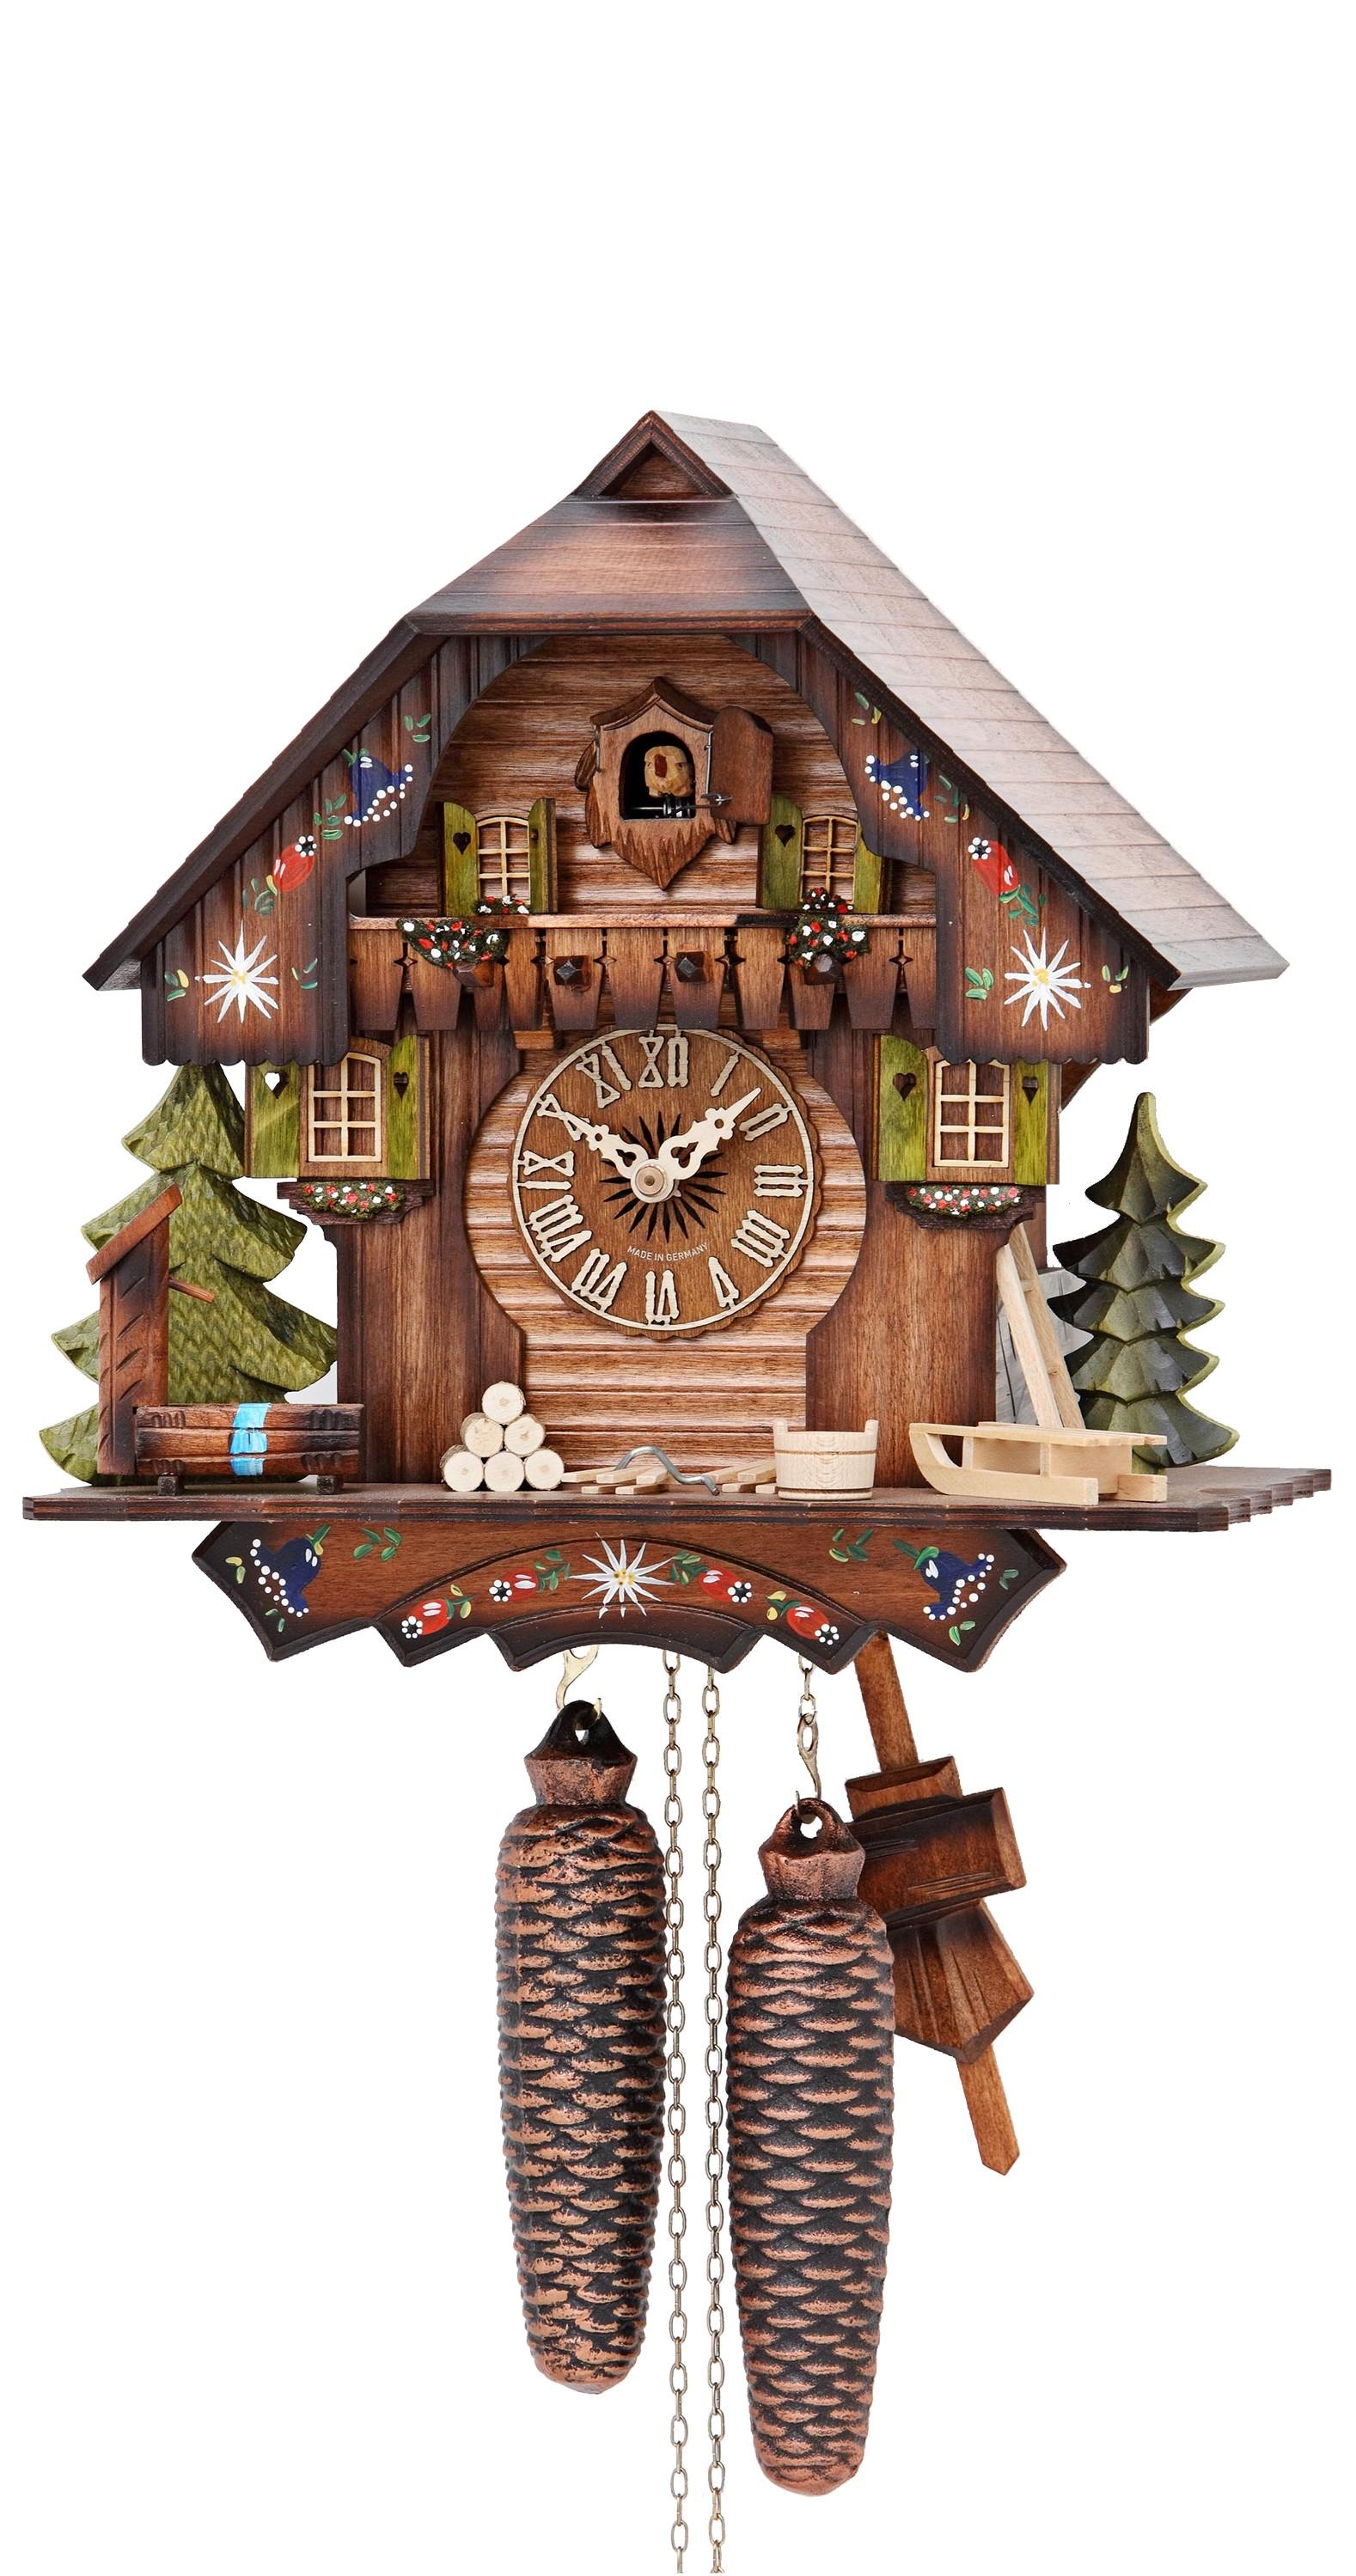 Cuckoo Clocku003cbru003eBlack Forest house KA 876 EX - Cuckoo Clock PNG HD